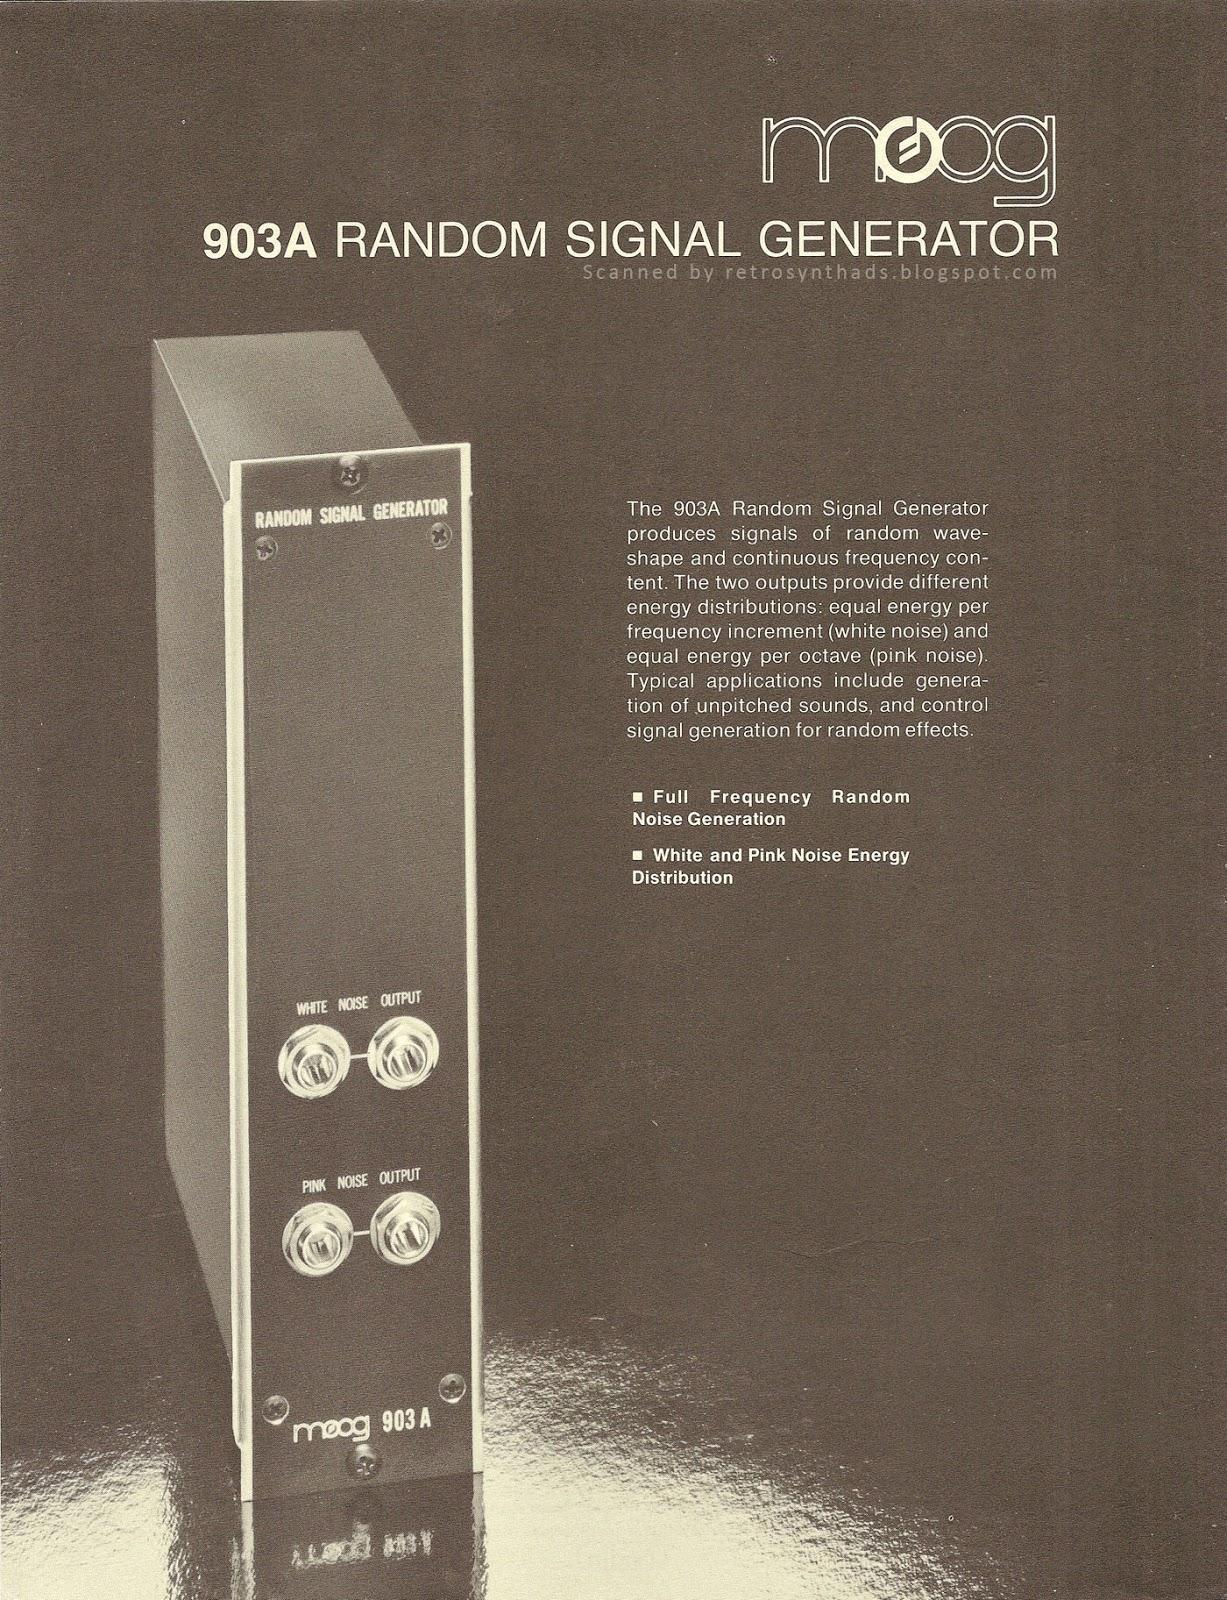 http://retrosynthads.blogspot.ca/2014/09/moog-903a-random-signal-generator.html